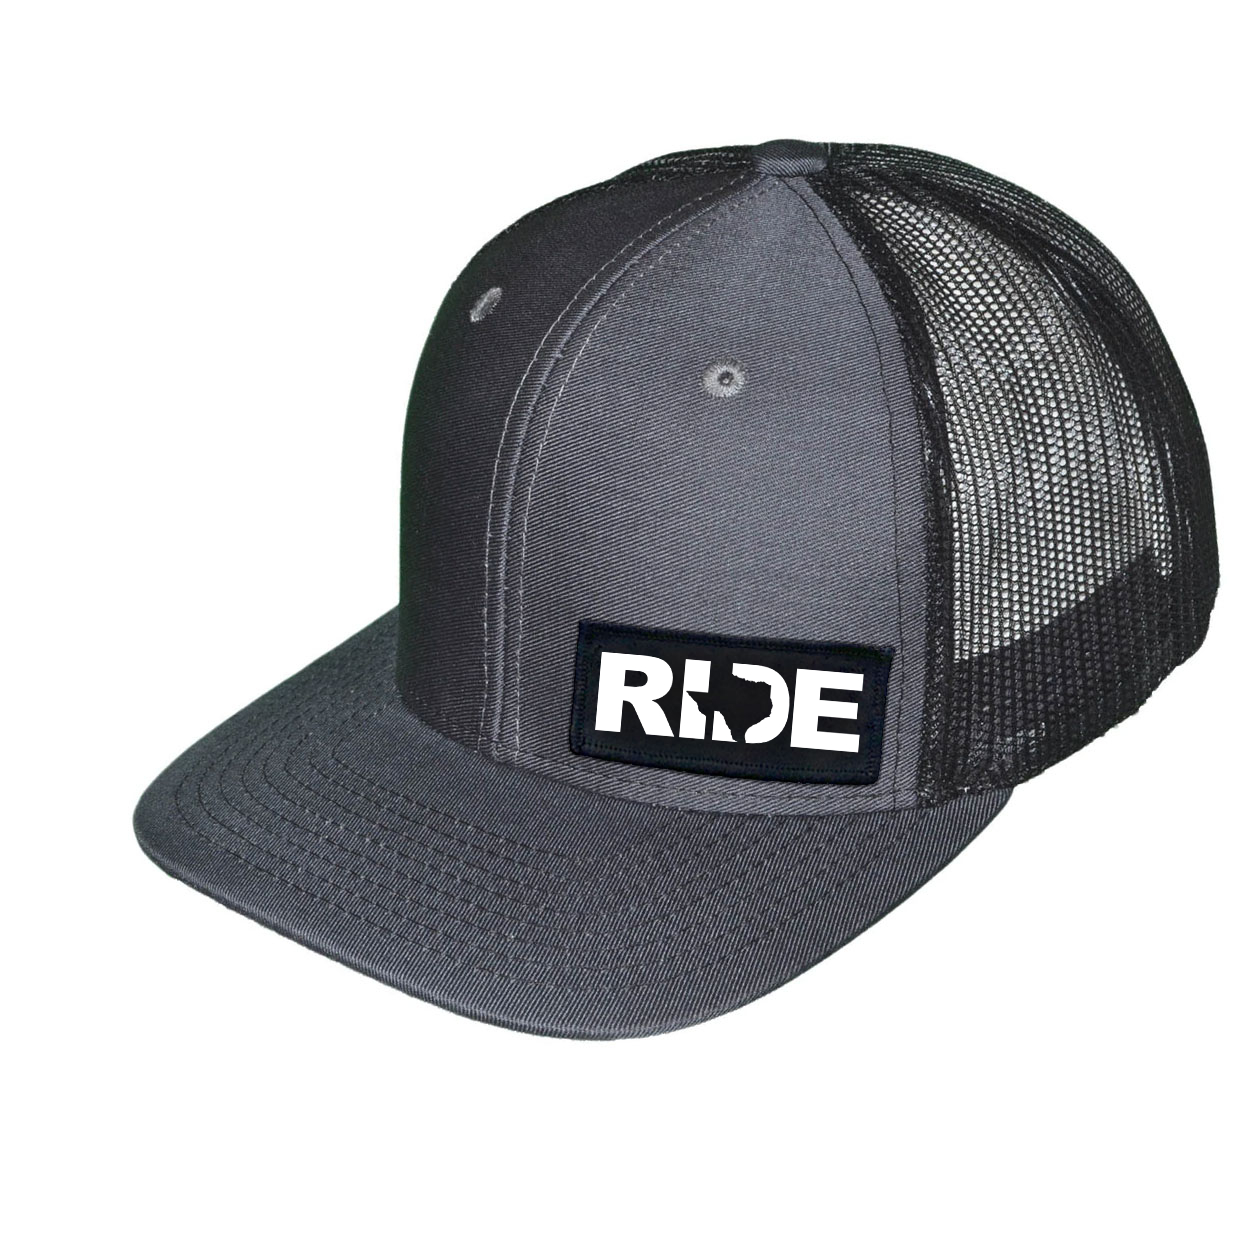 Ride Texas Night Out Woven Patch Snapback Trucker Hat Dark Gray/Black (White Logo)